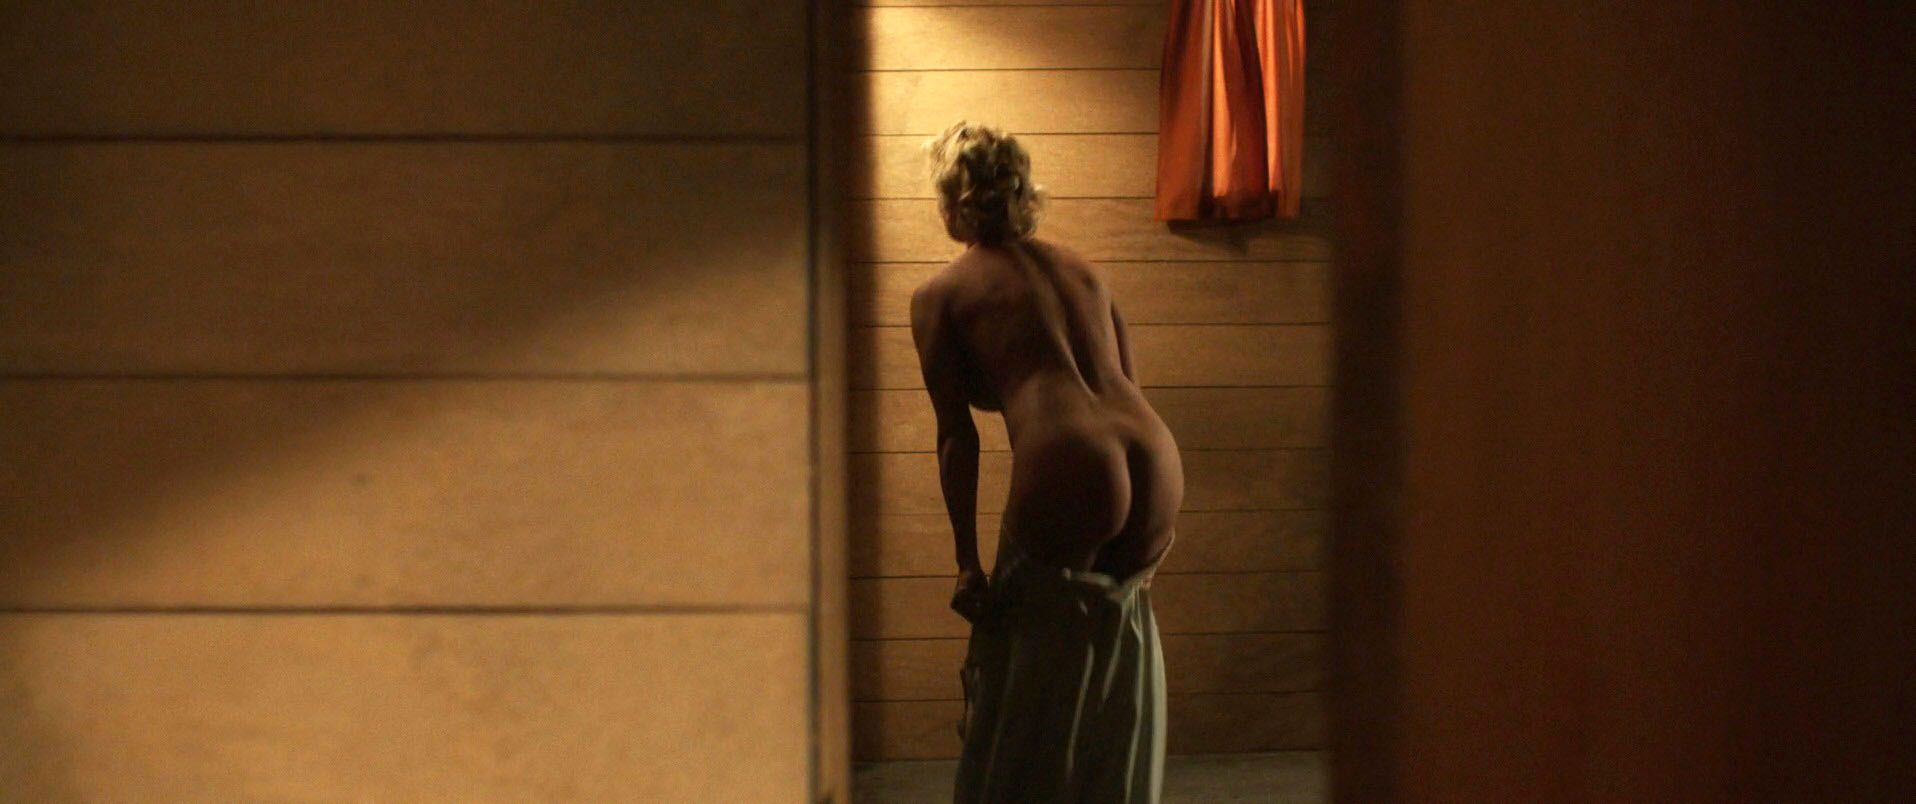 Pamela Anderson Nude 3 Sn6525